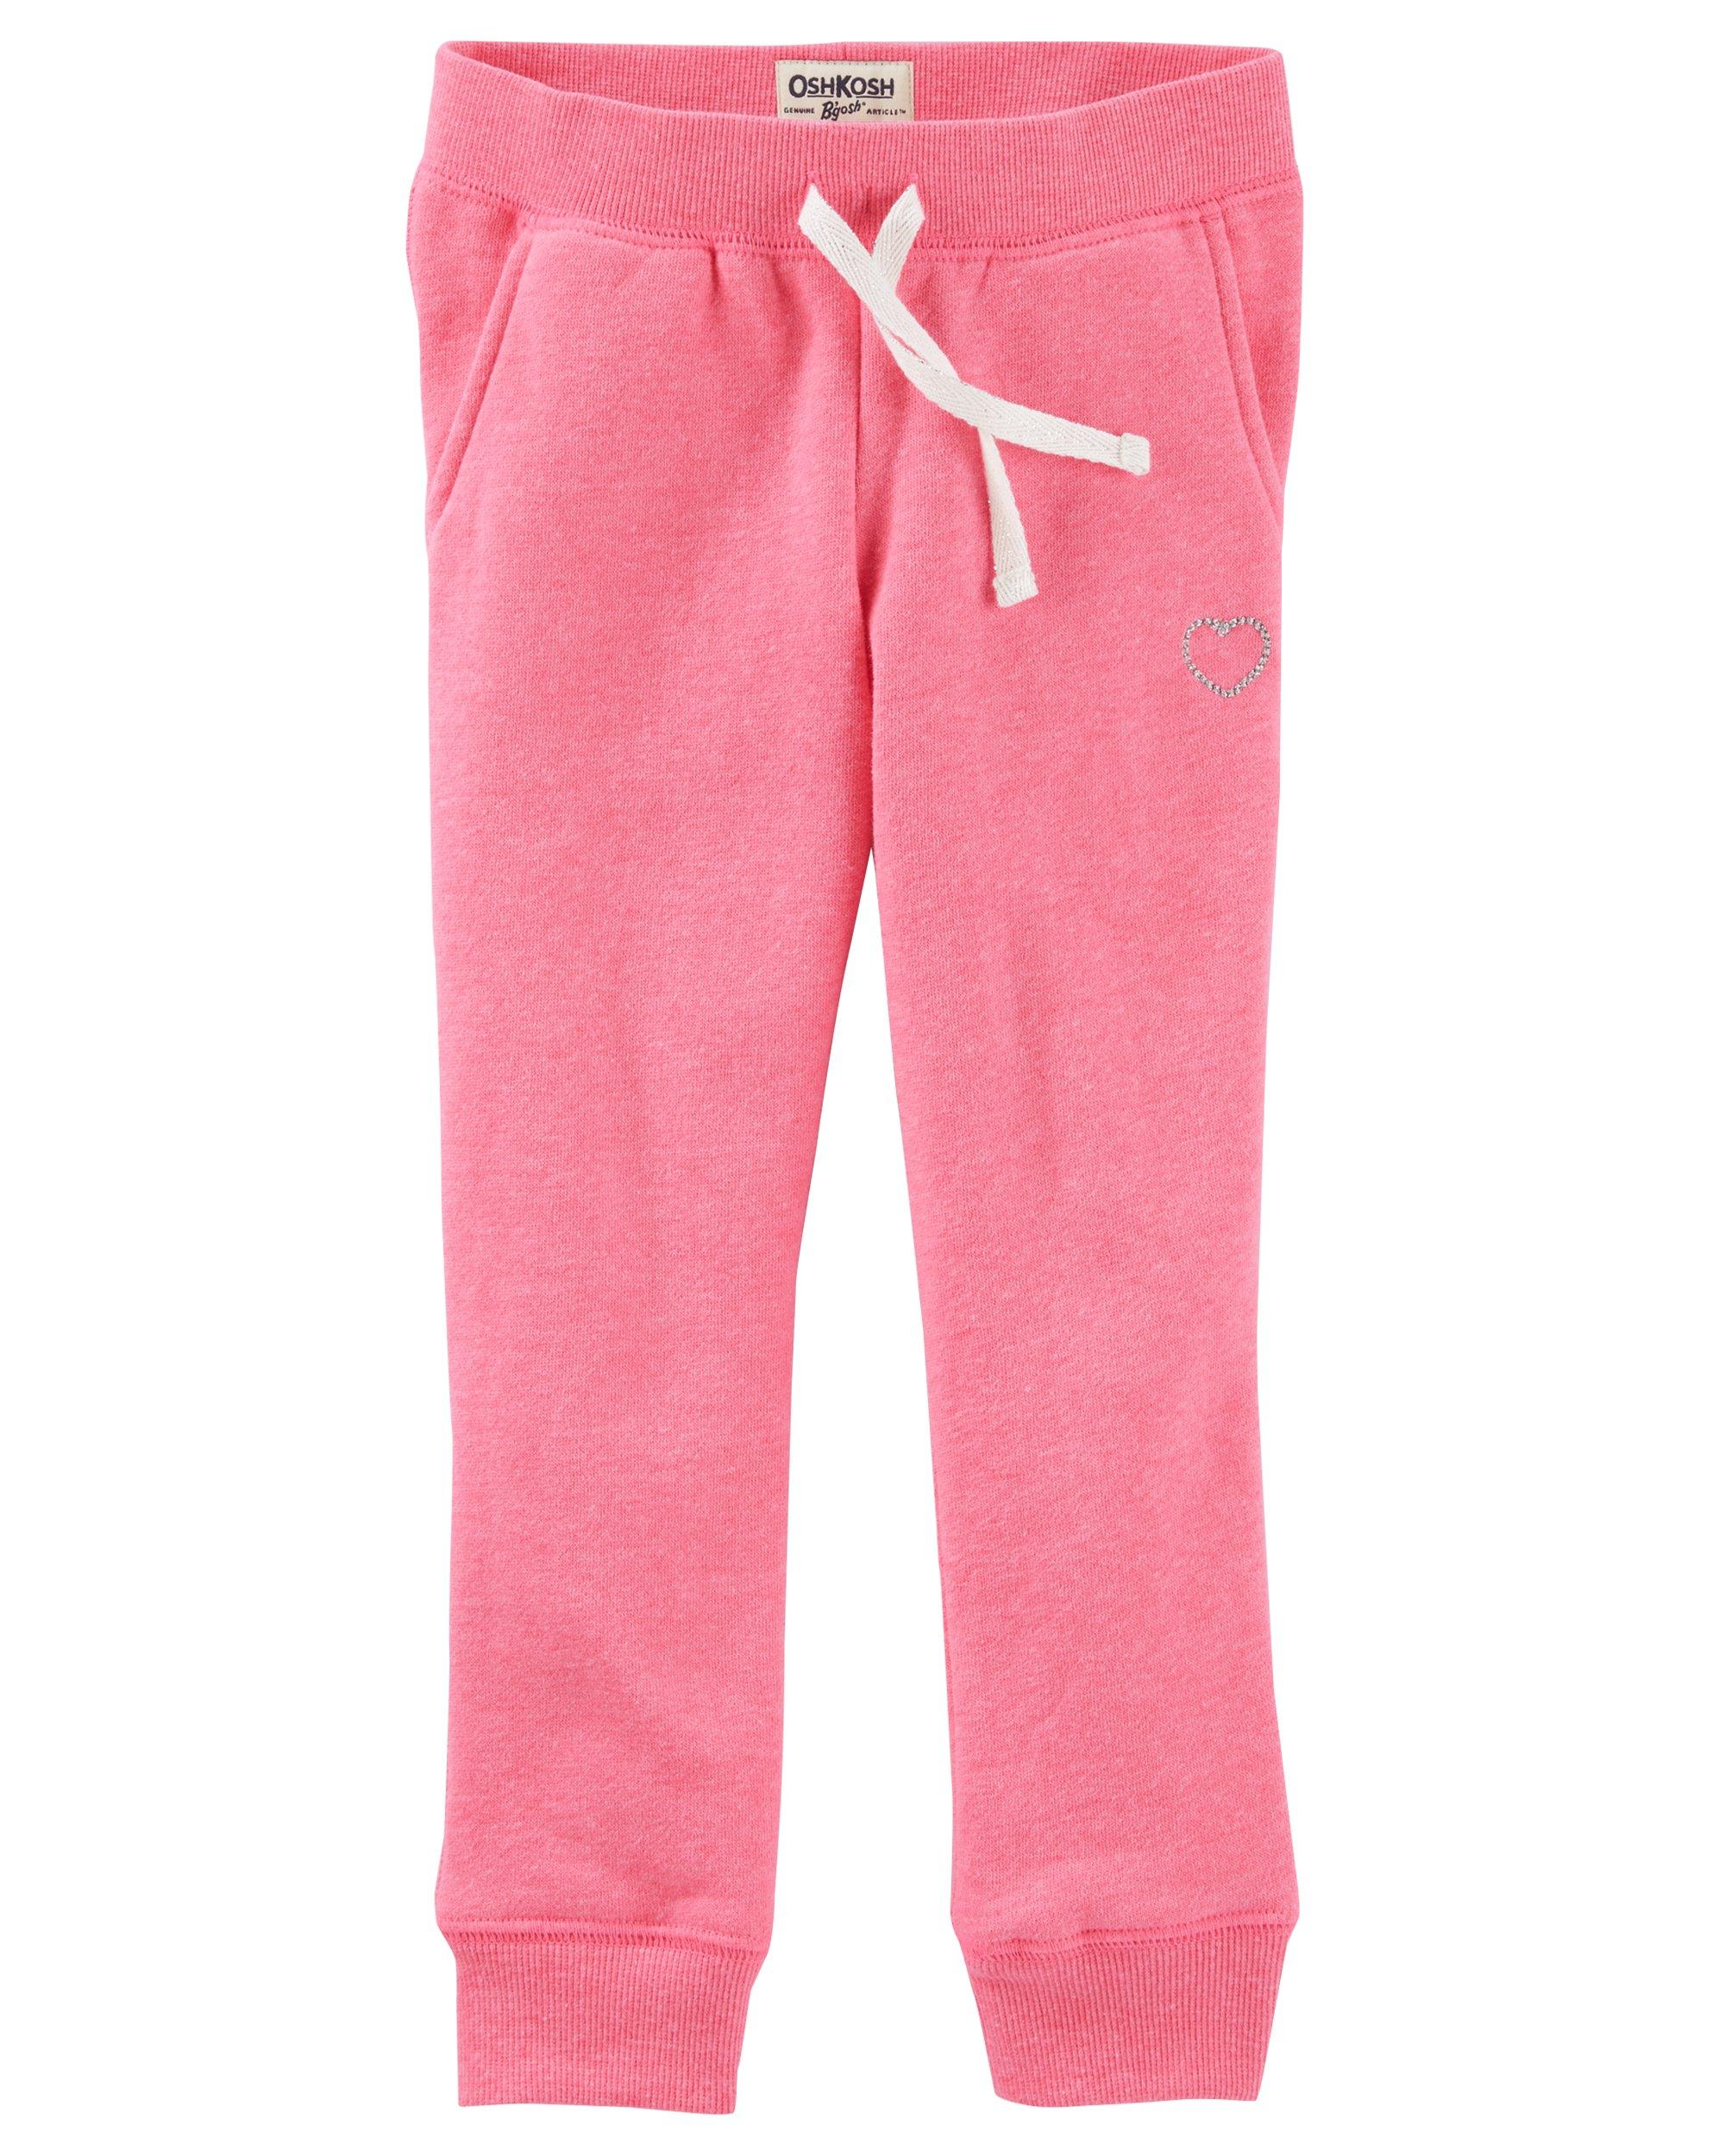 Osh Kosh Girls' Toddler Fleece Jogger Pants, Pink, 4T